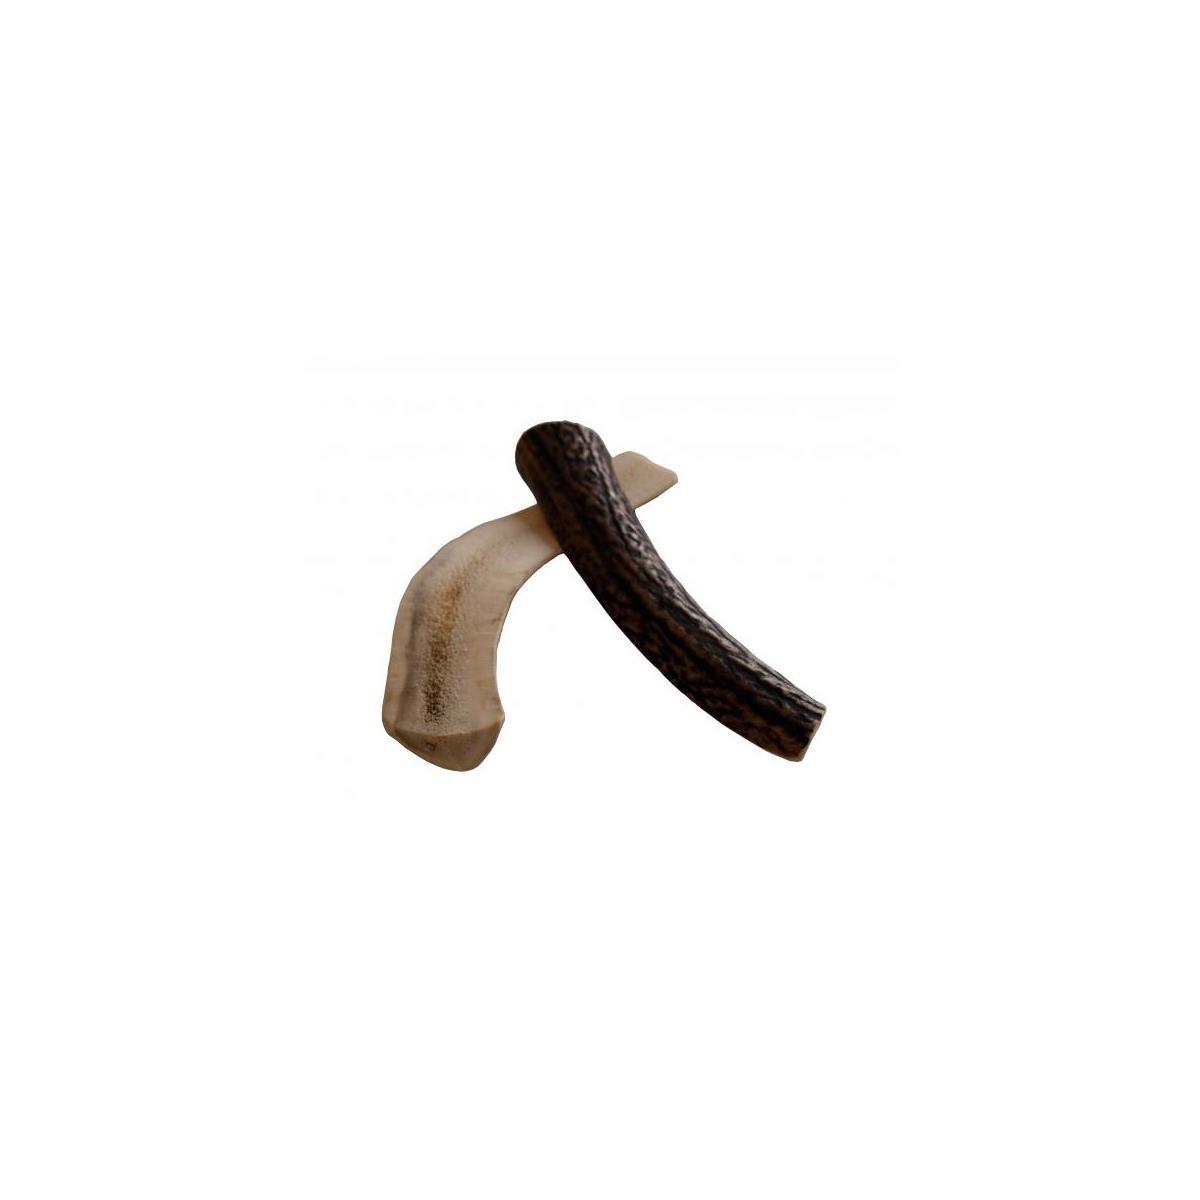 Chewies Geweih-Snack Halb M Kausnack Abwurfstangen Zahnpflege